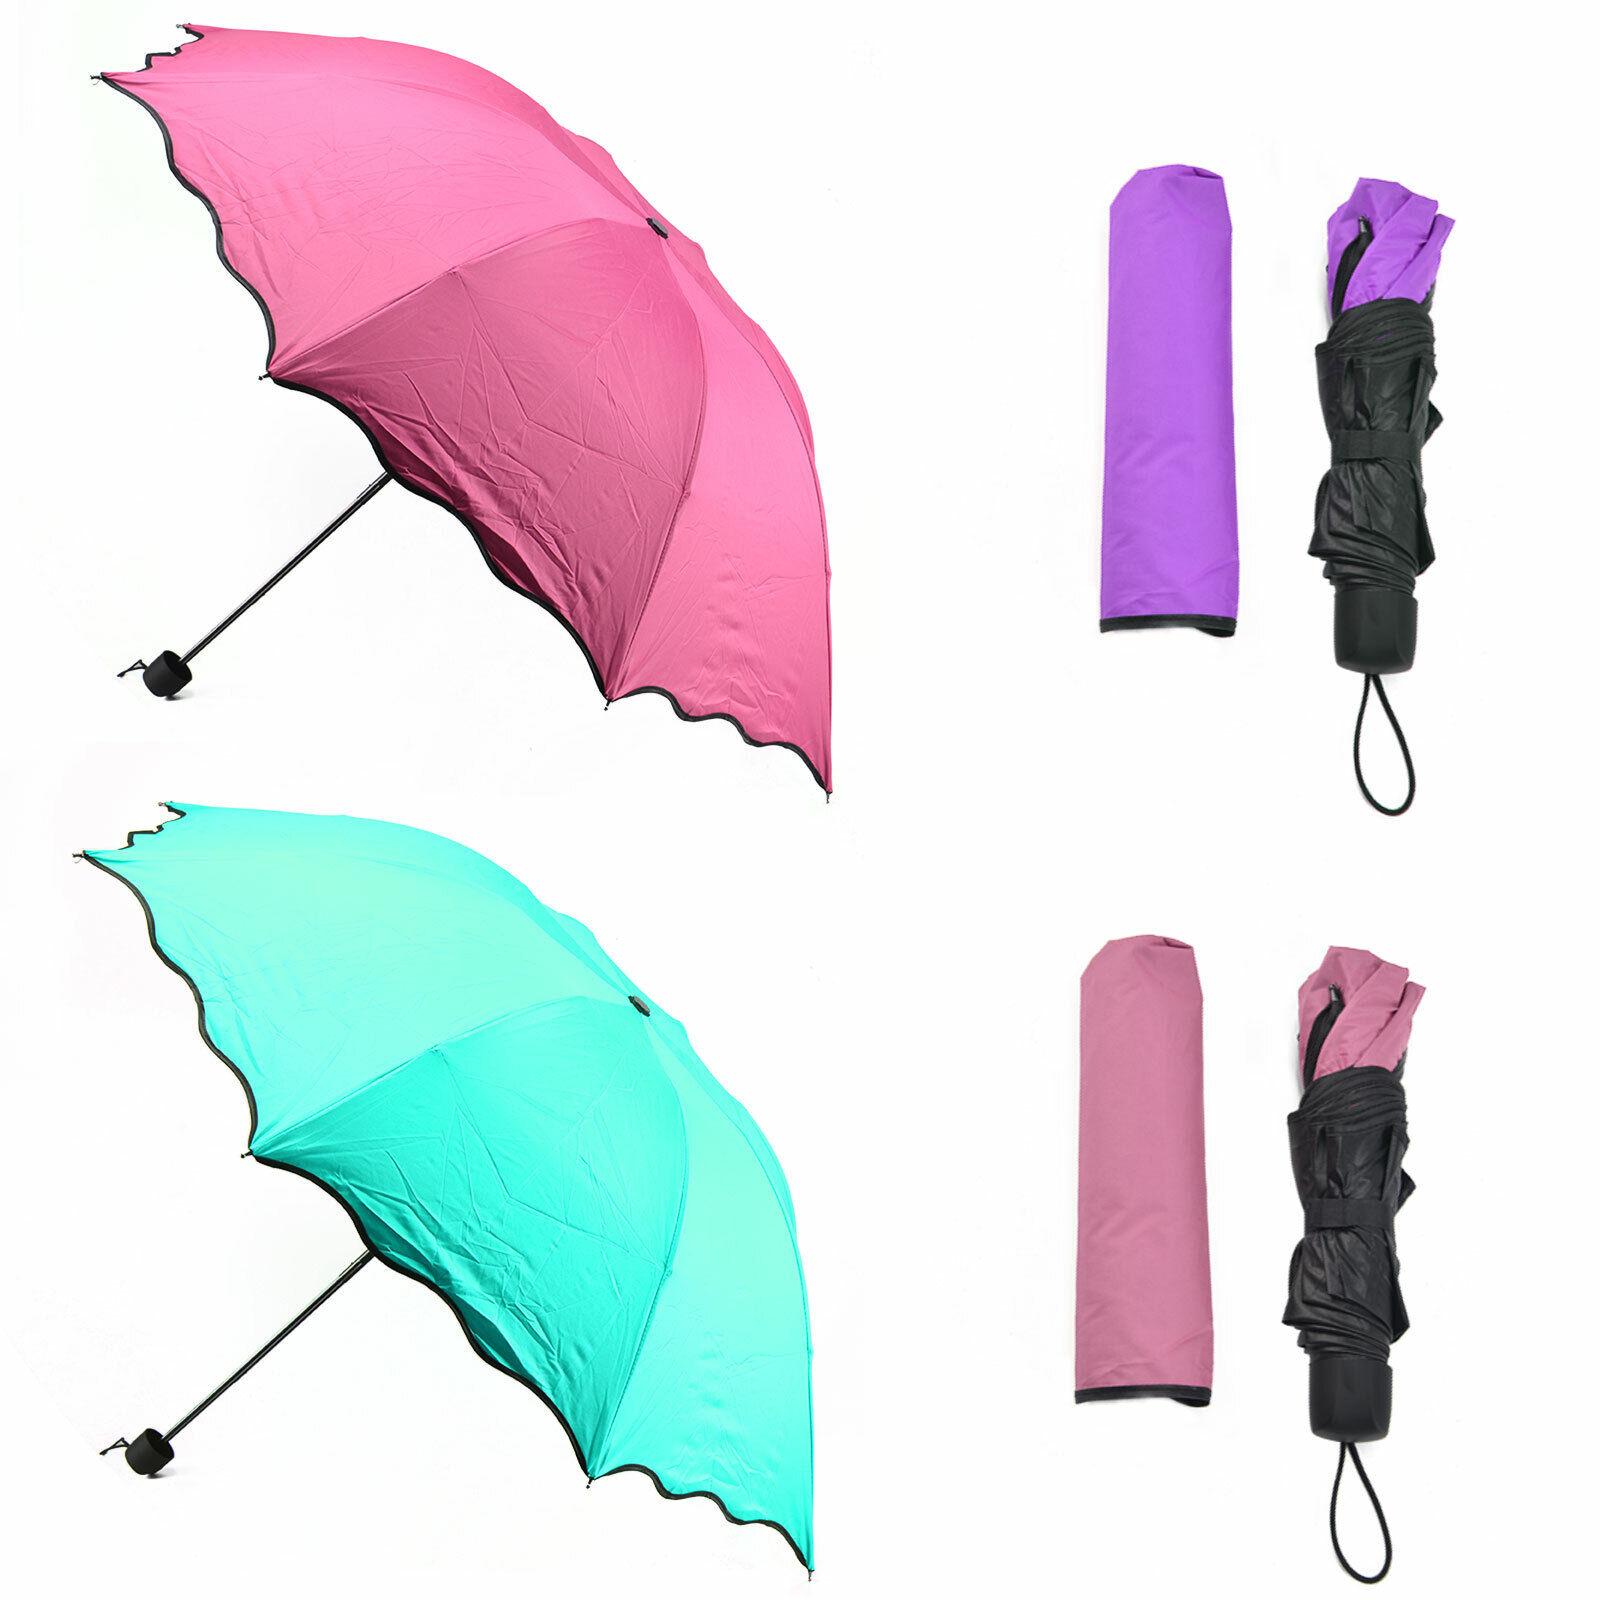 Windproof Anti-uv Sun Rain Umbrellas Colour Changing Compact Flowers Folding